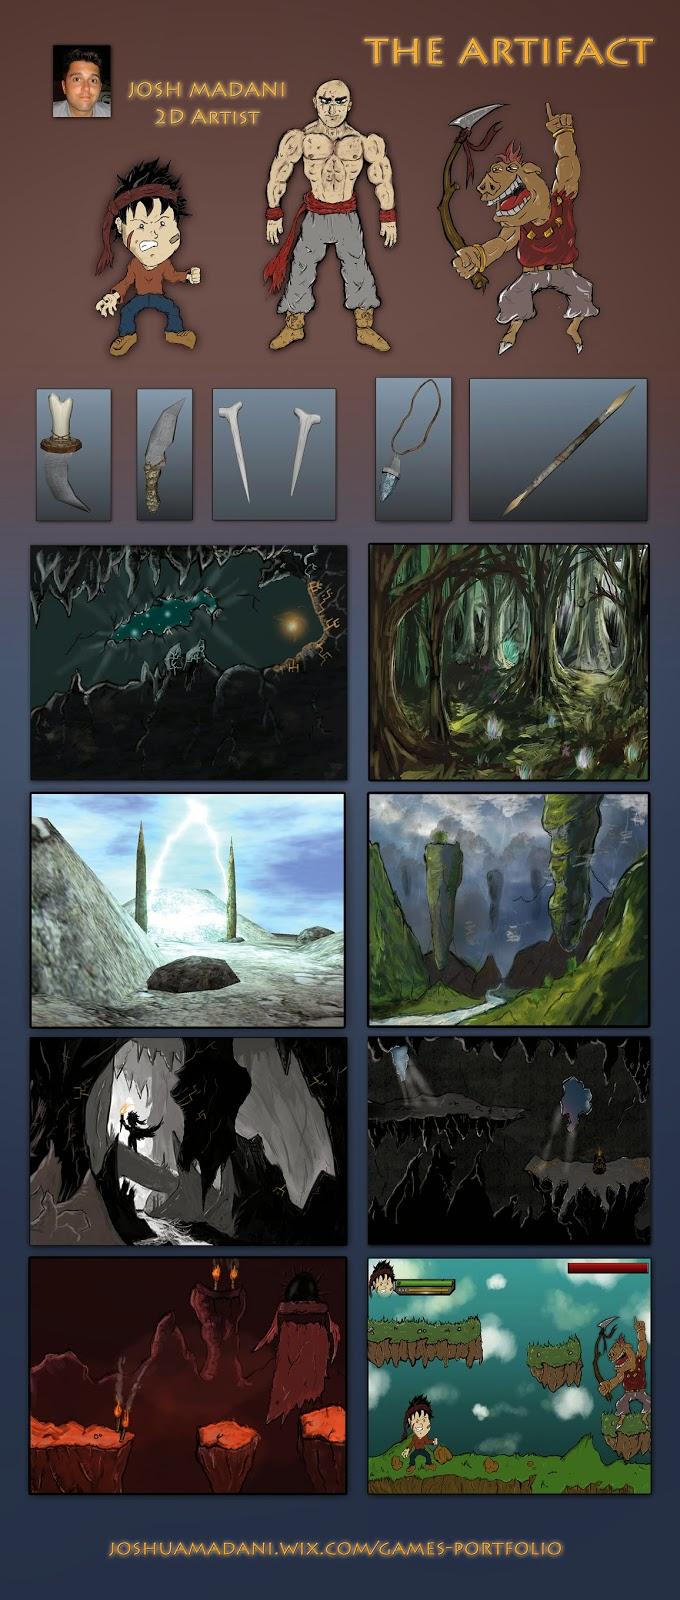 http://joshuamadani.wix.com/games-portfolio